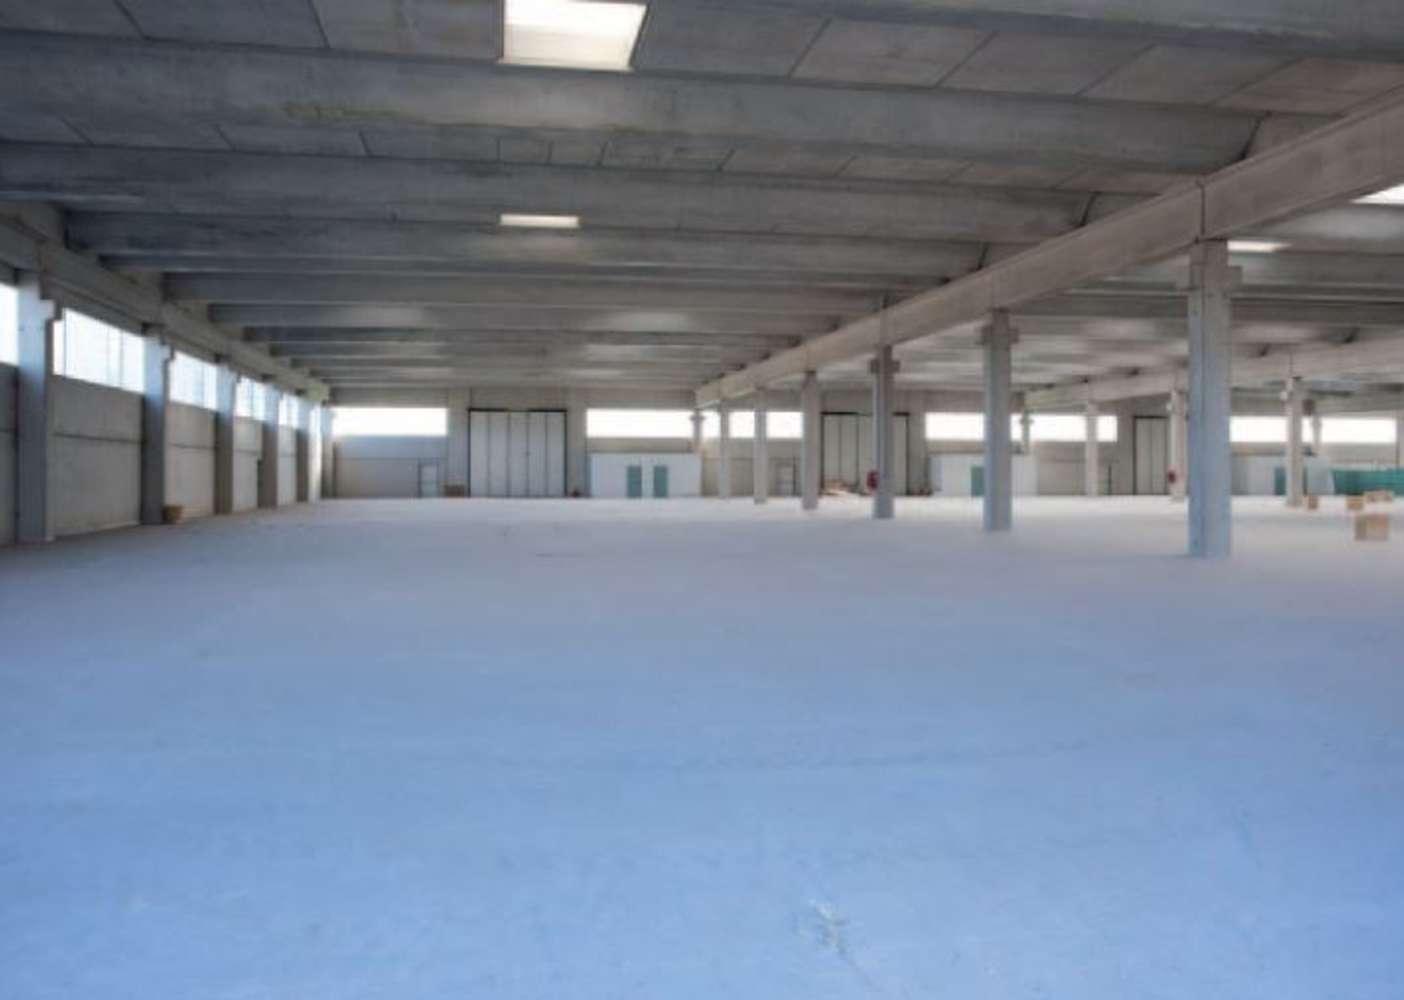 Magazzini industriali e logistici Busto garolfo, 20020 - Busto Garolfo